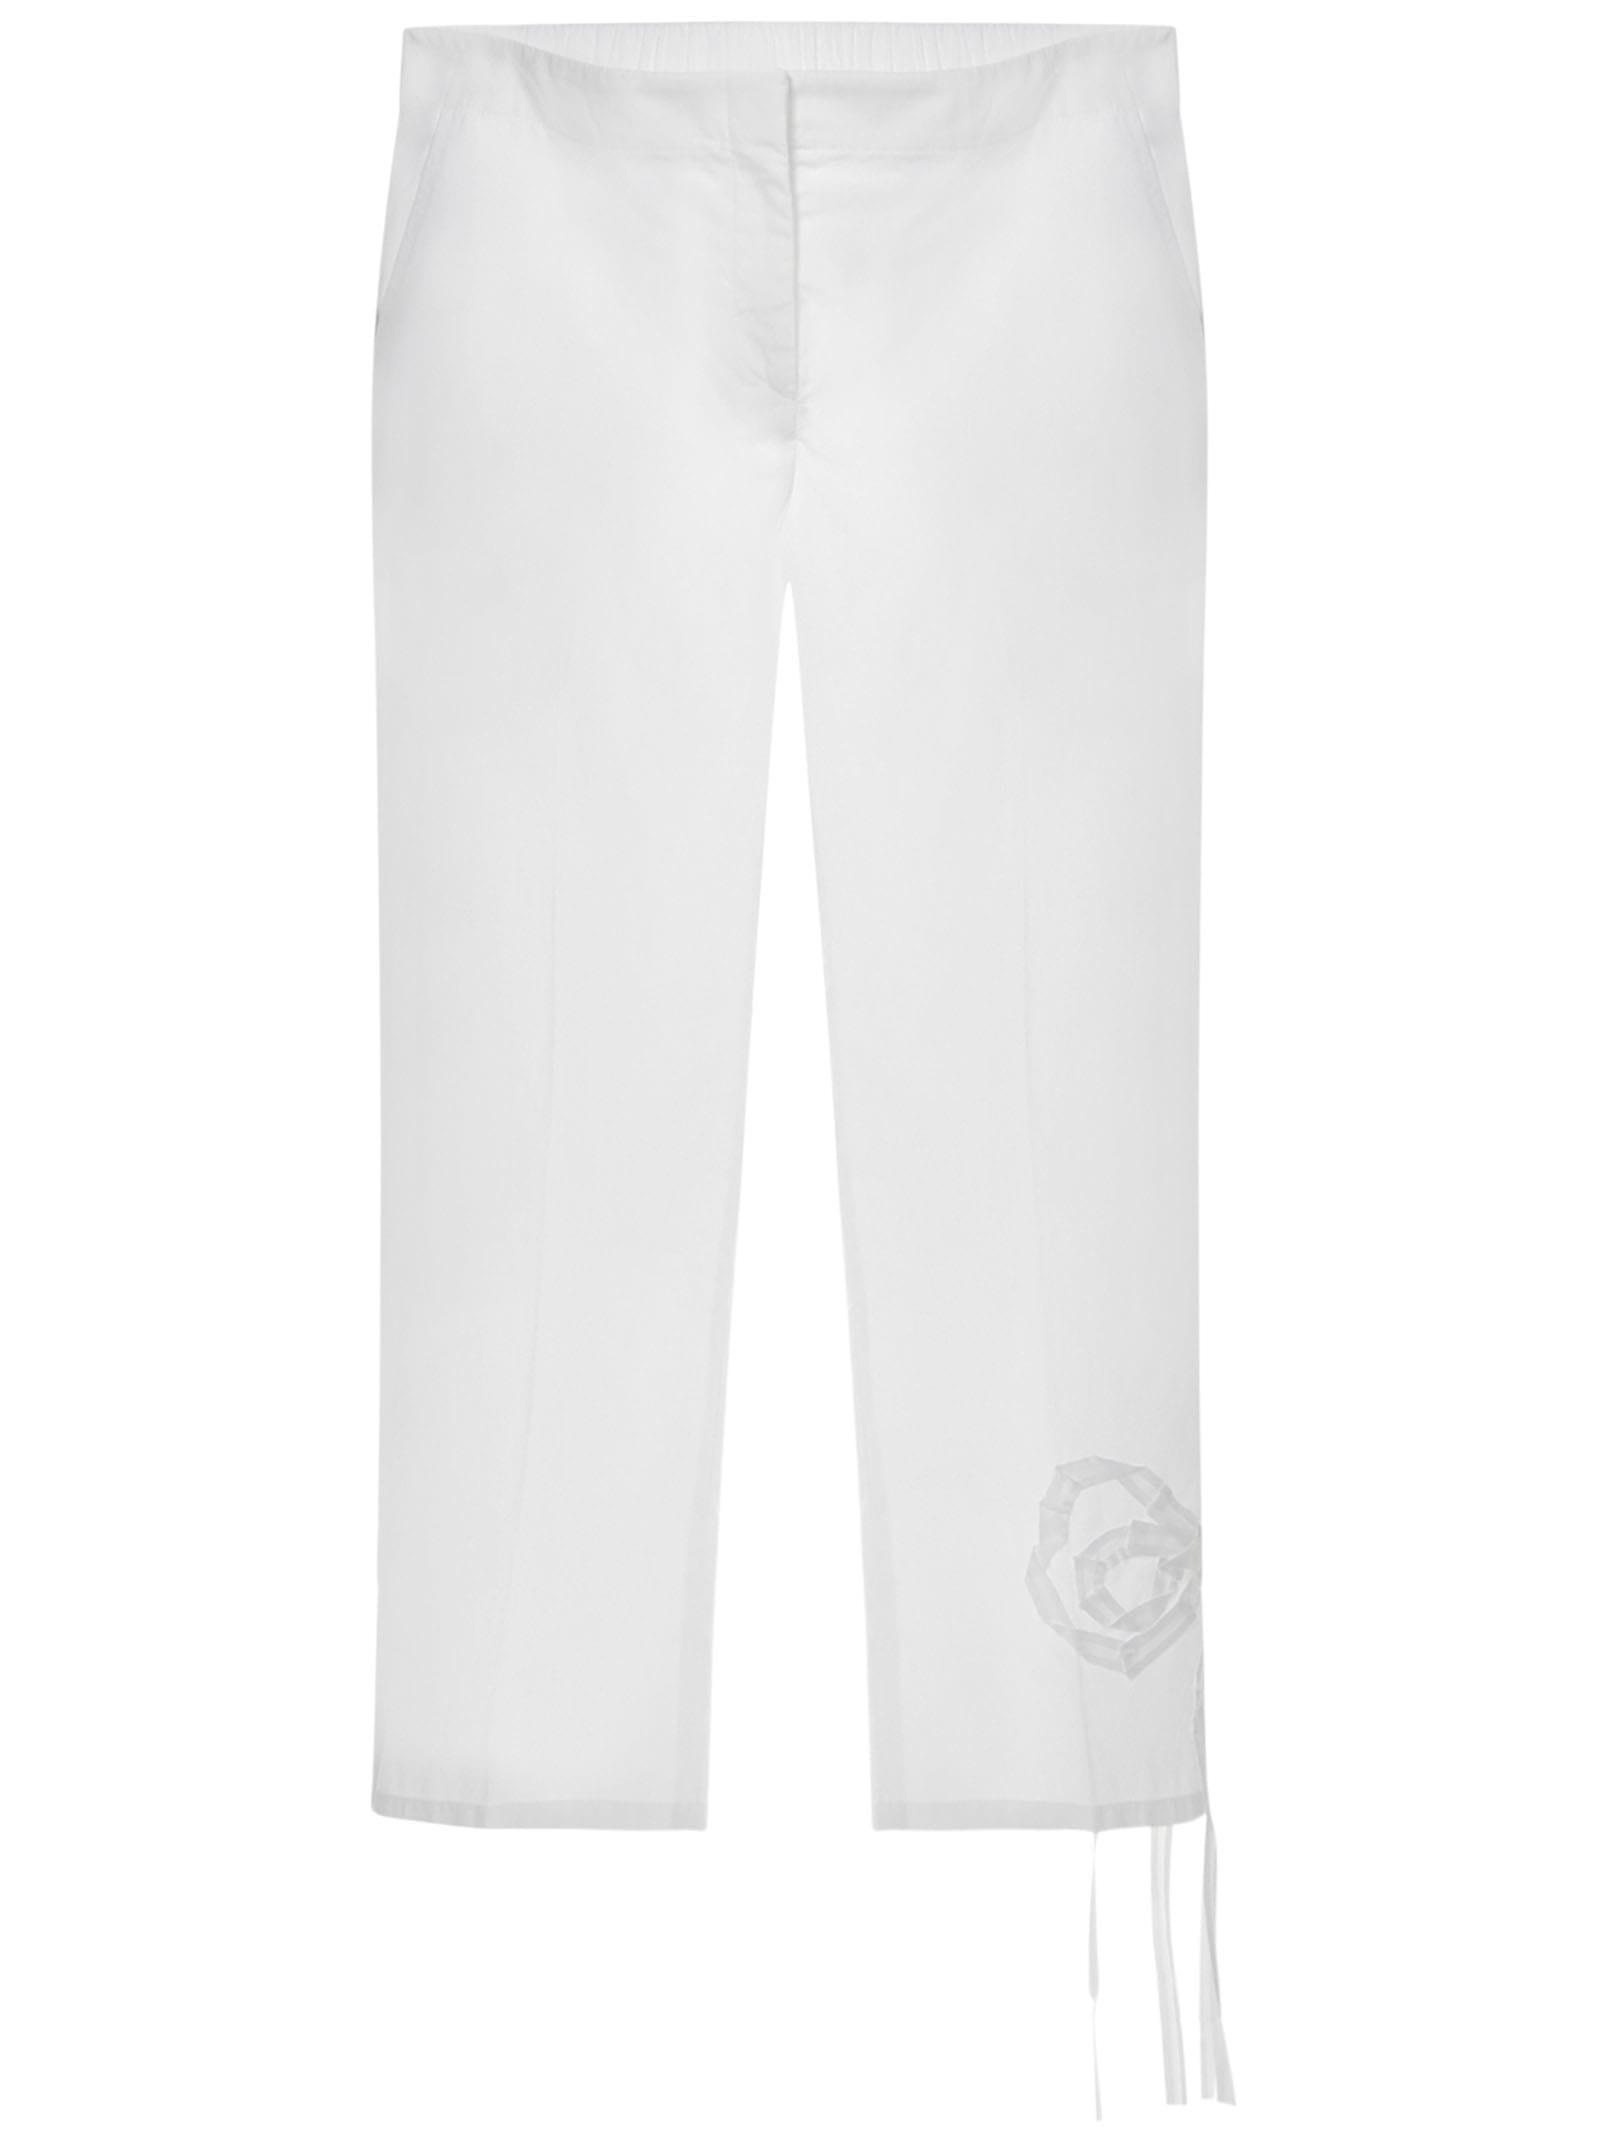 N°21 Trousers